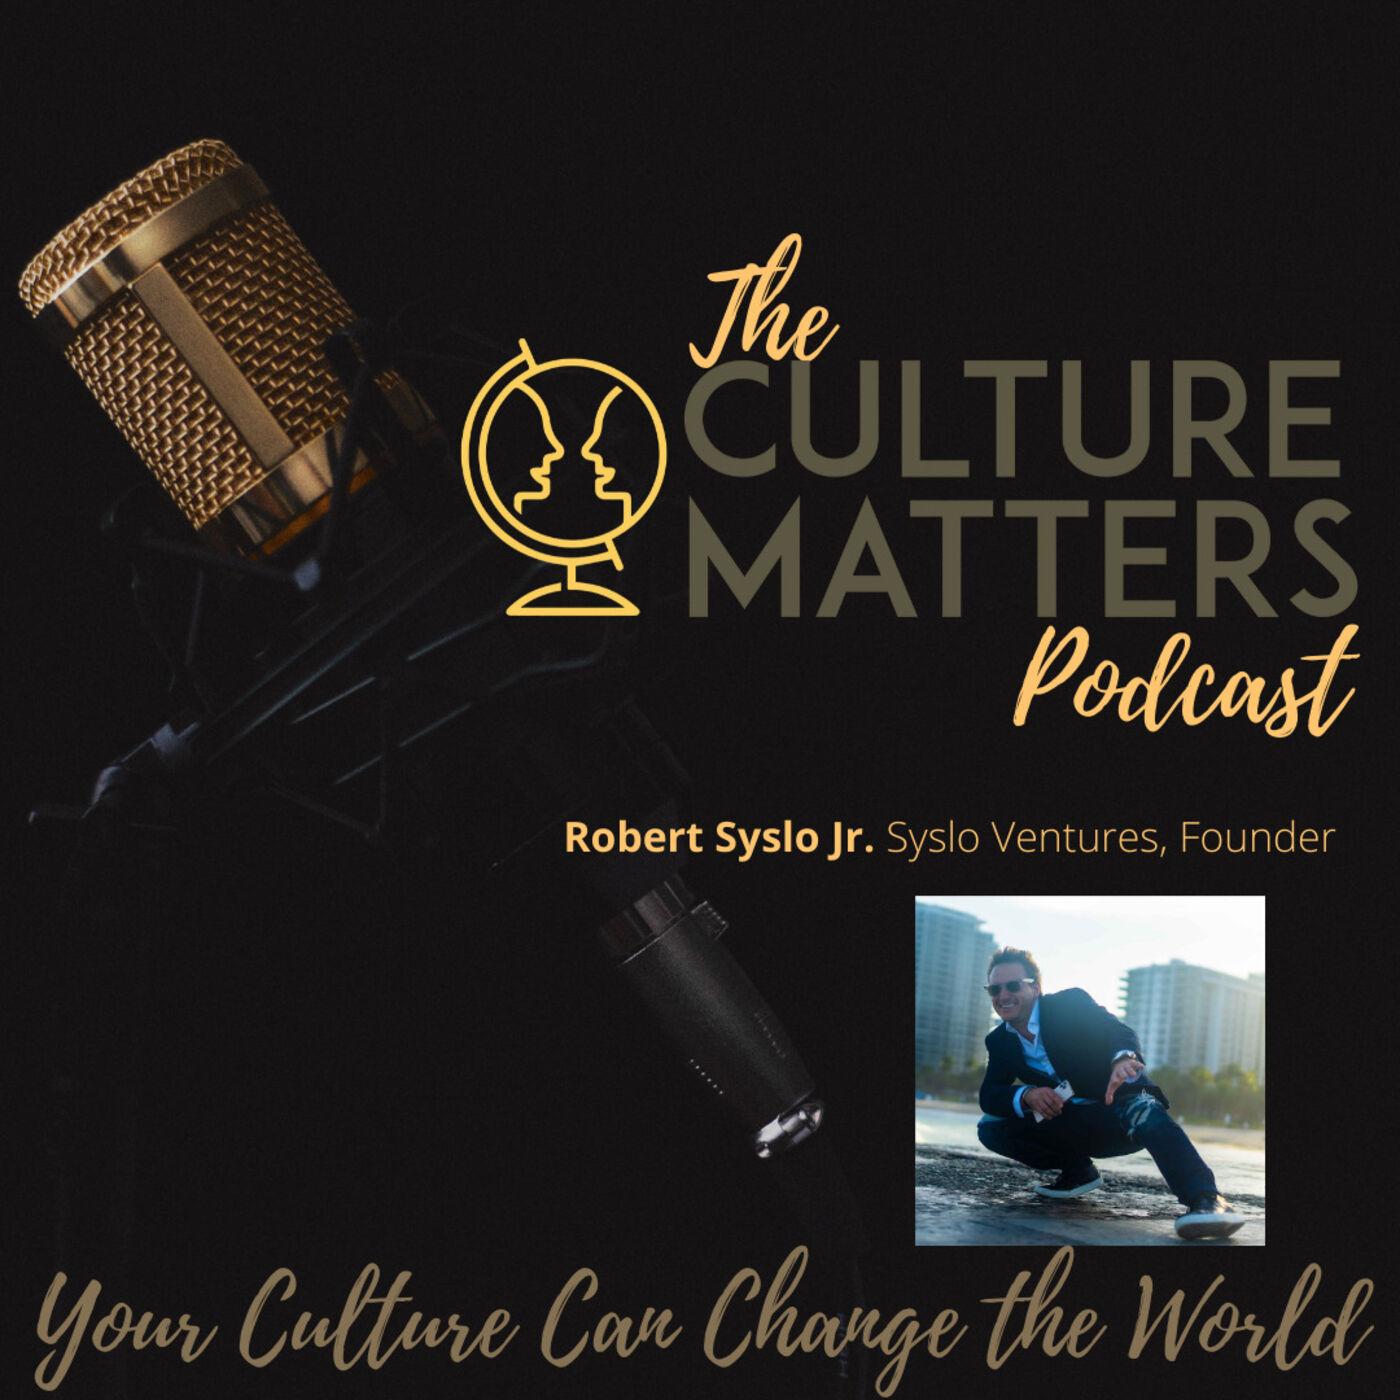 Season 7, Episode 81: Guest: Robert Syslo Jr.: Why We Follow Who We Follow